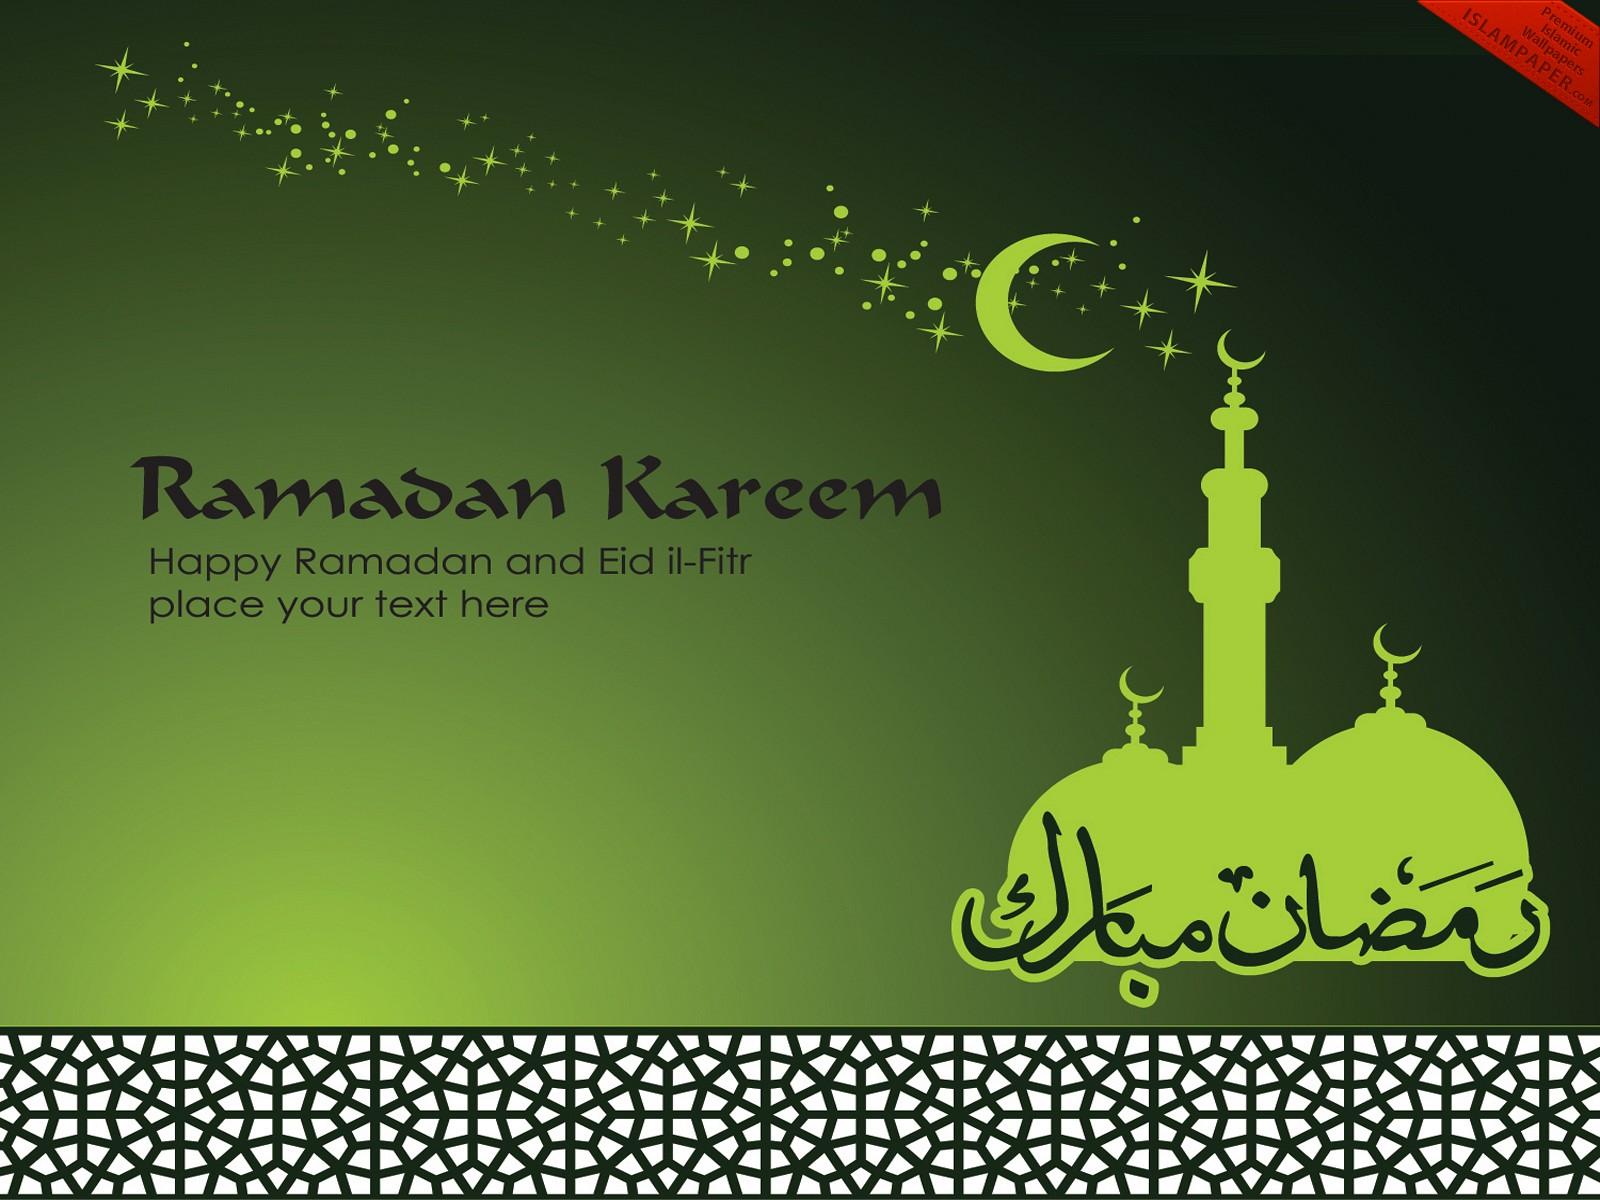 Happy Eid Ramadhan Fitri - Happy Eid Ramadhan Fitri